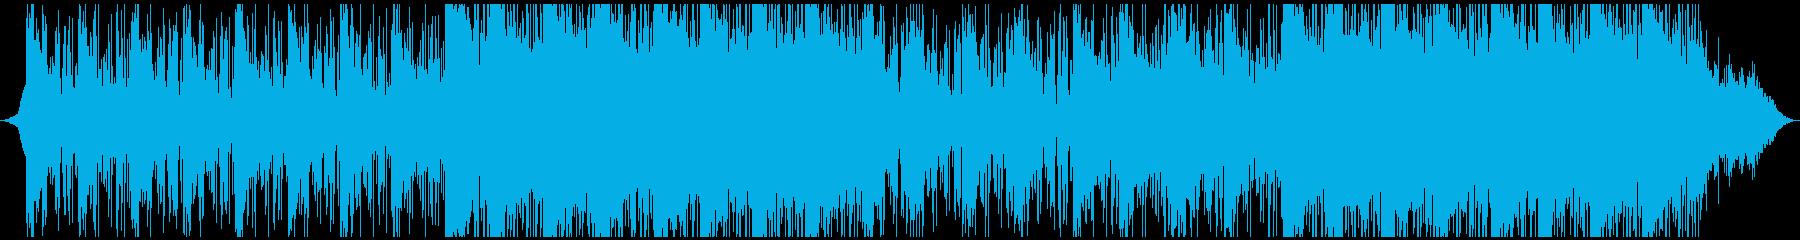 Tomorowlandの再生済みの波形